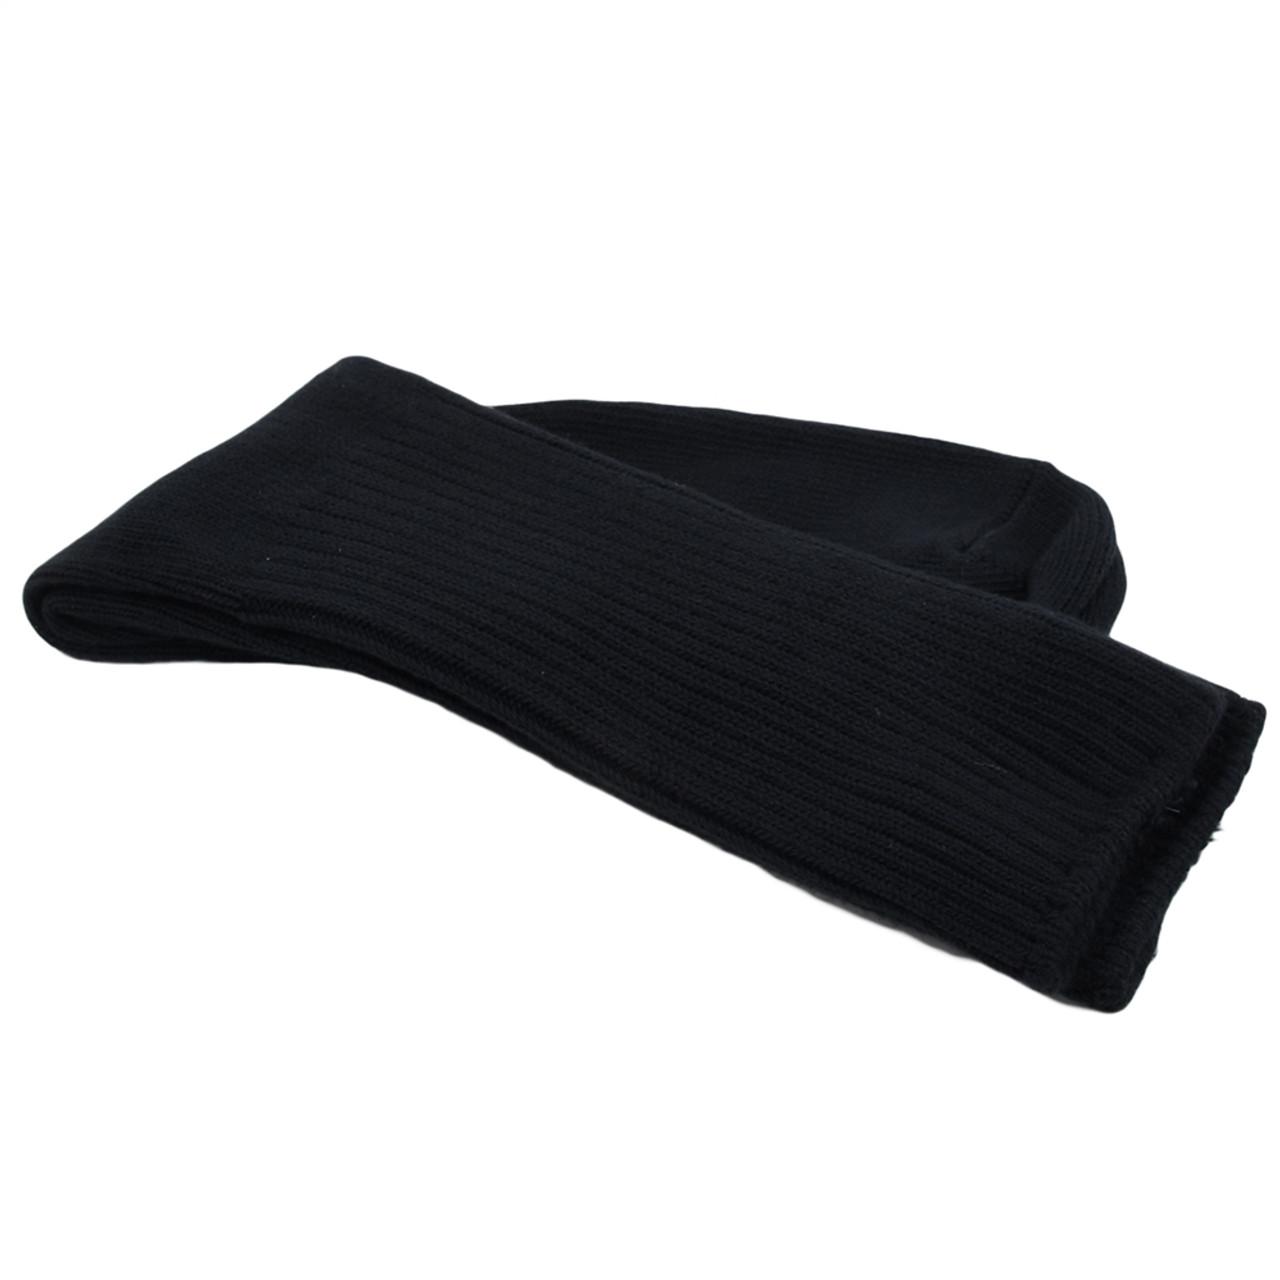 Organic Cotton Crew Socks - Black, Large (w10-11.5, m8-10)